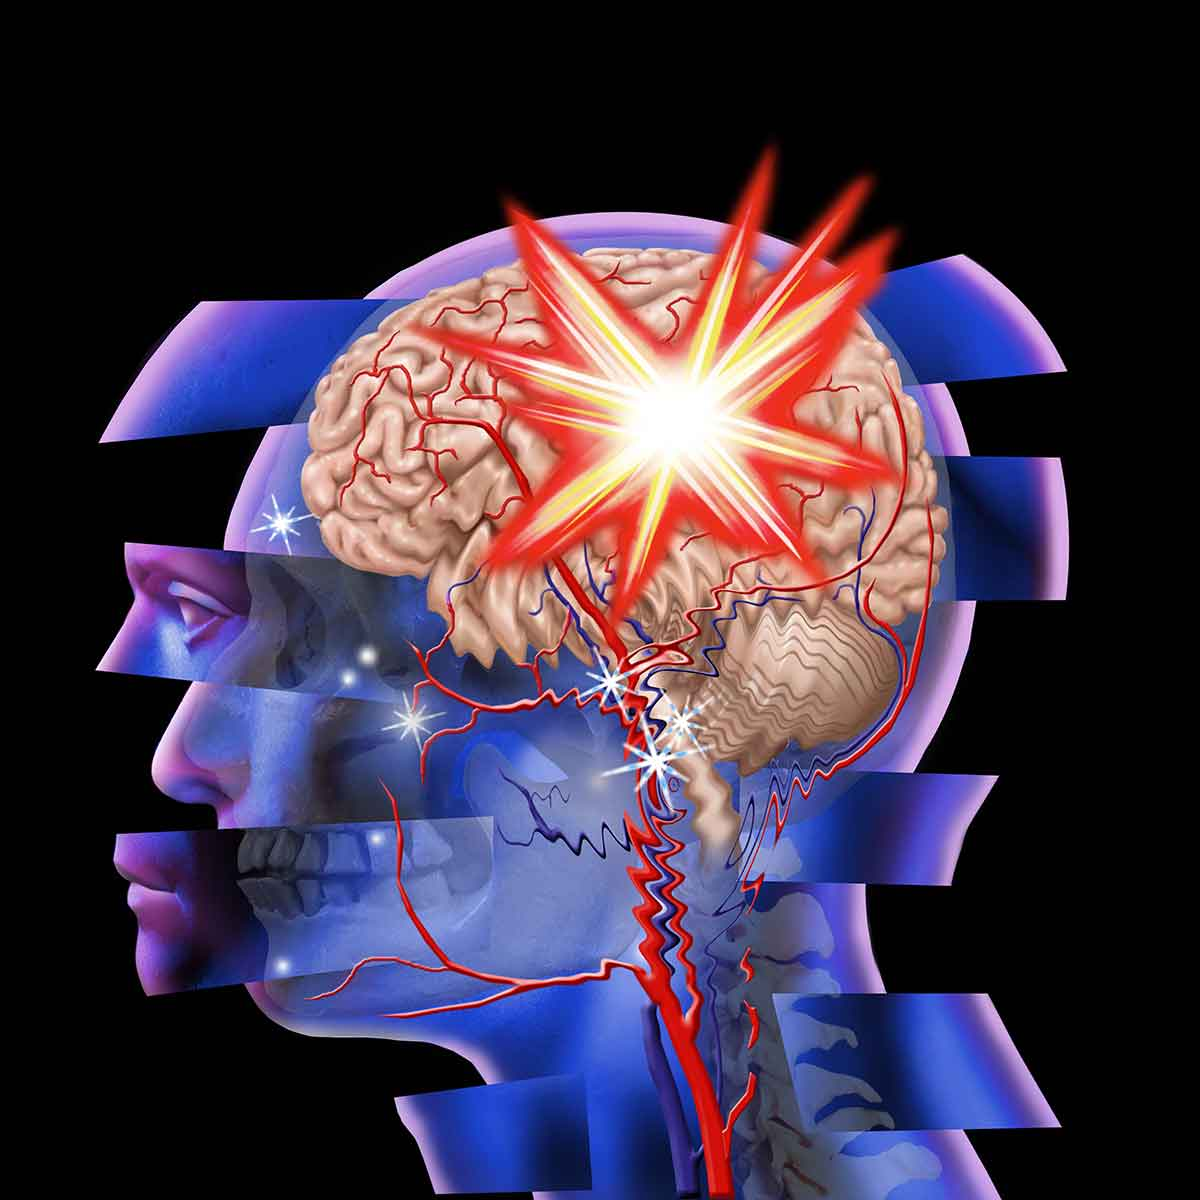 Traumatic Brain Injury And Drug Abuse